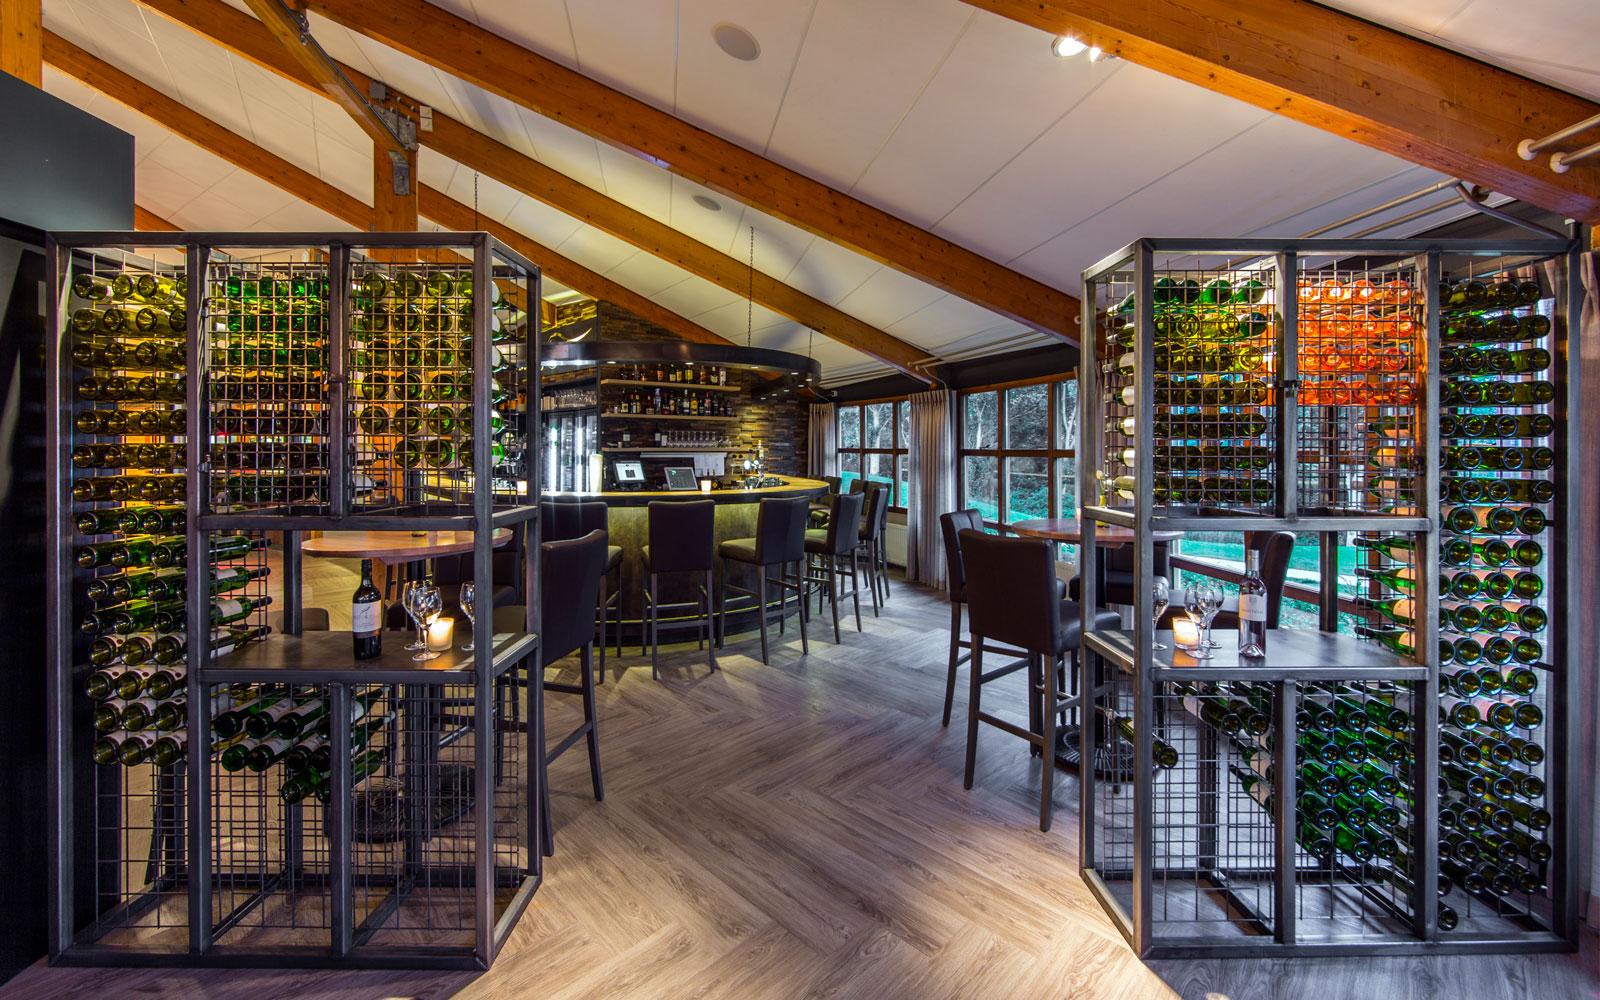 Brasserie, wijnrek, pvc vloer, visgraat, golfbaan, De Hooge Rotterdamsche, Versteegh Design